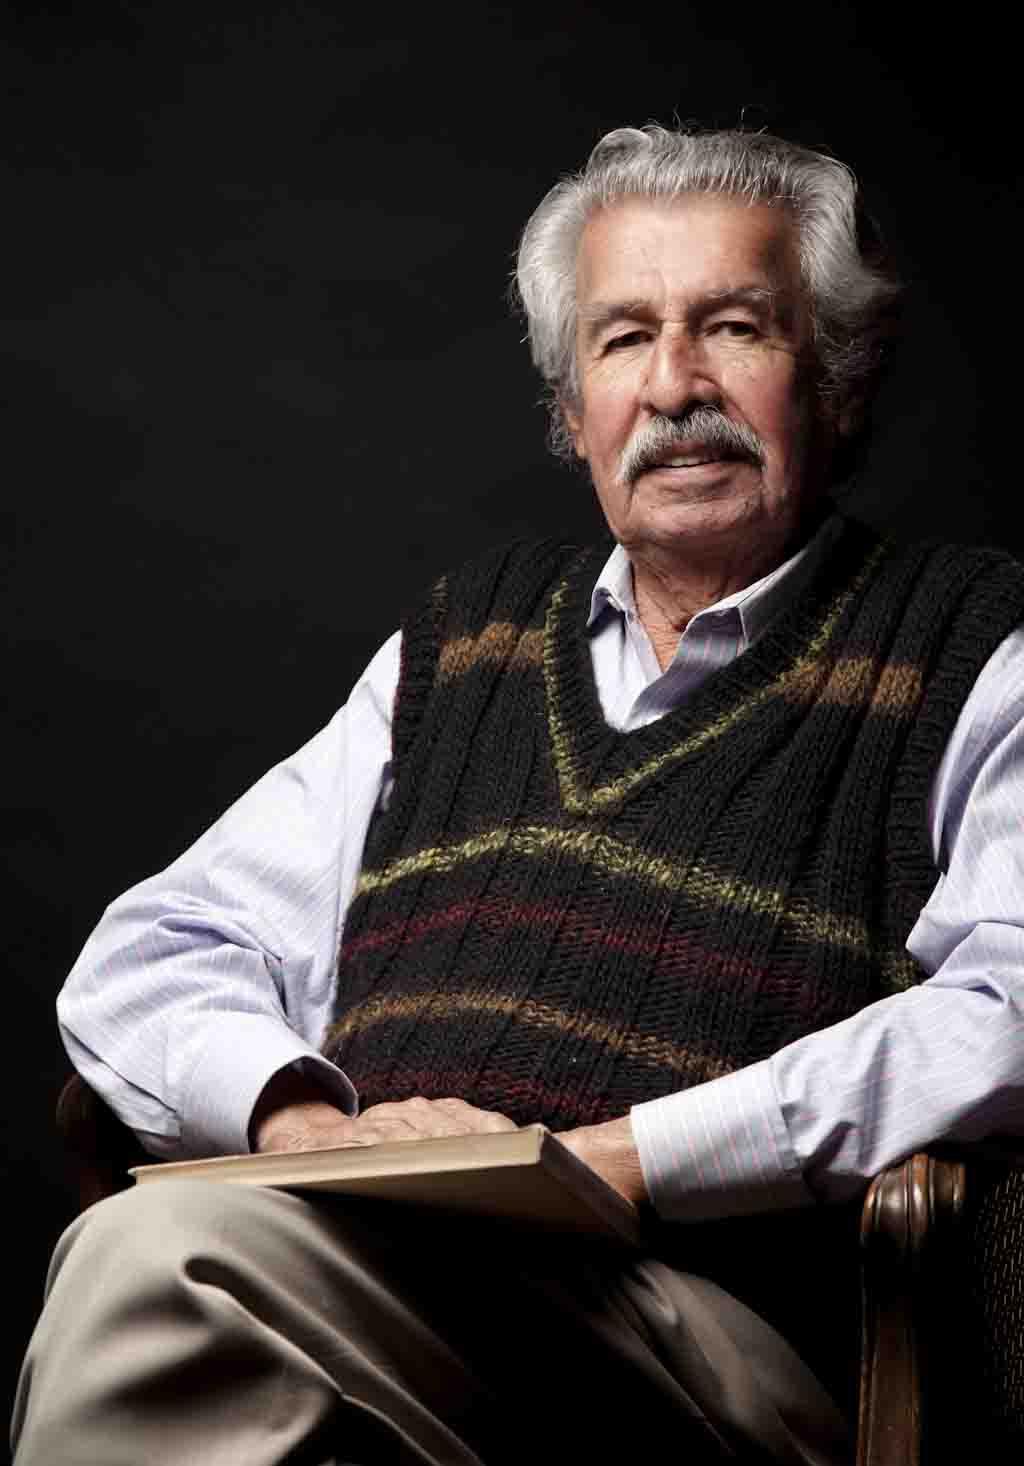 Gustavo Arias Murueta